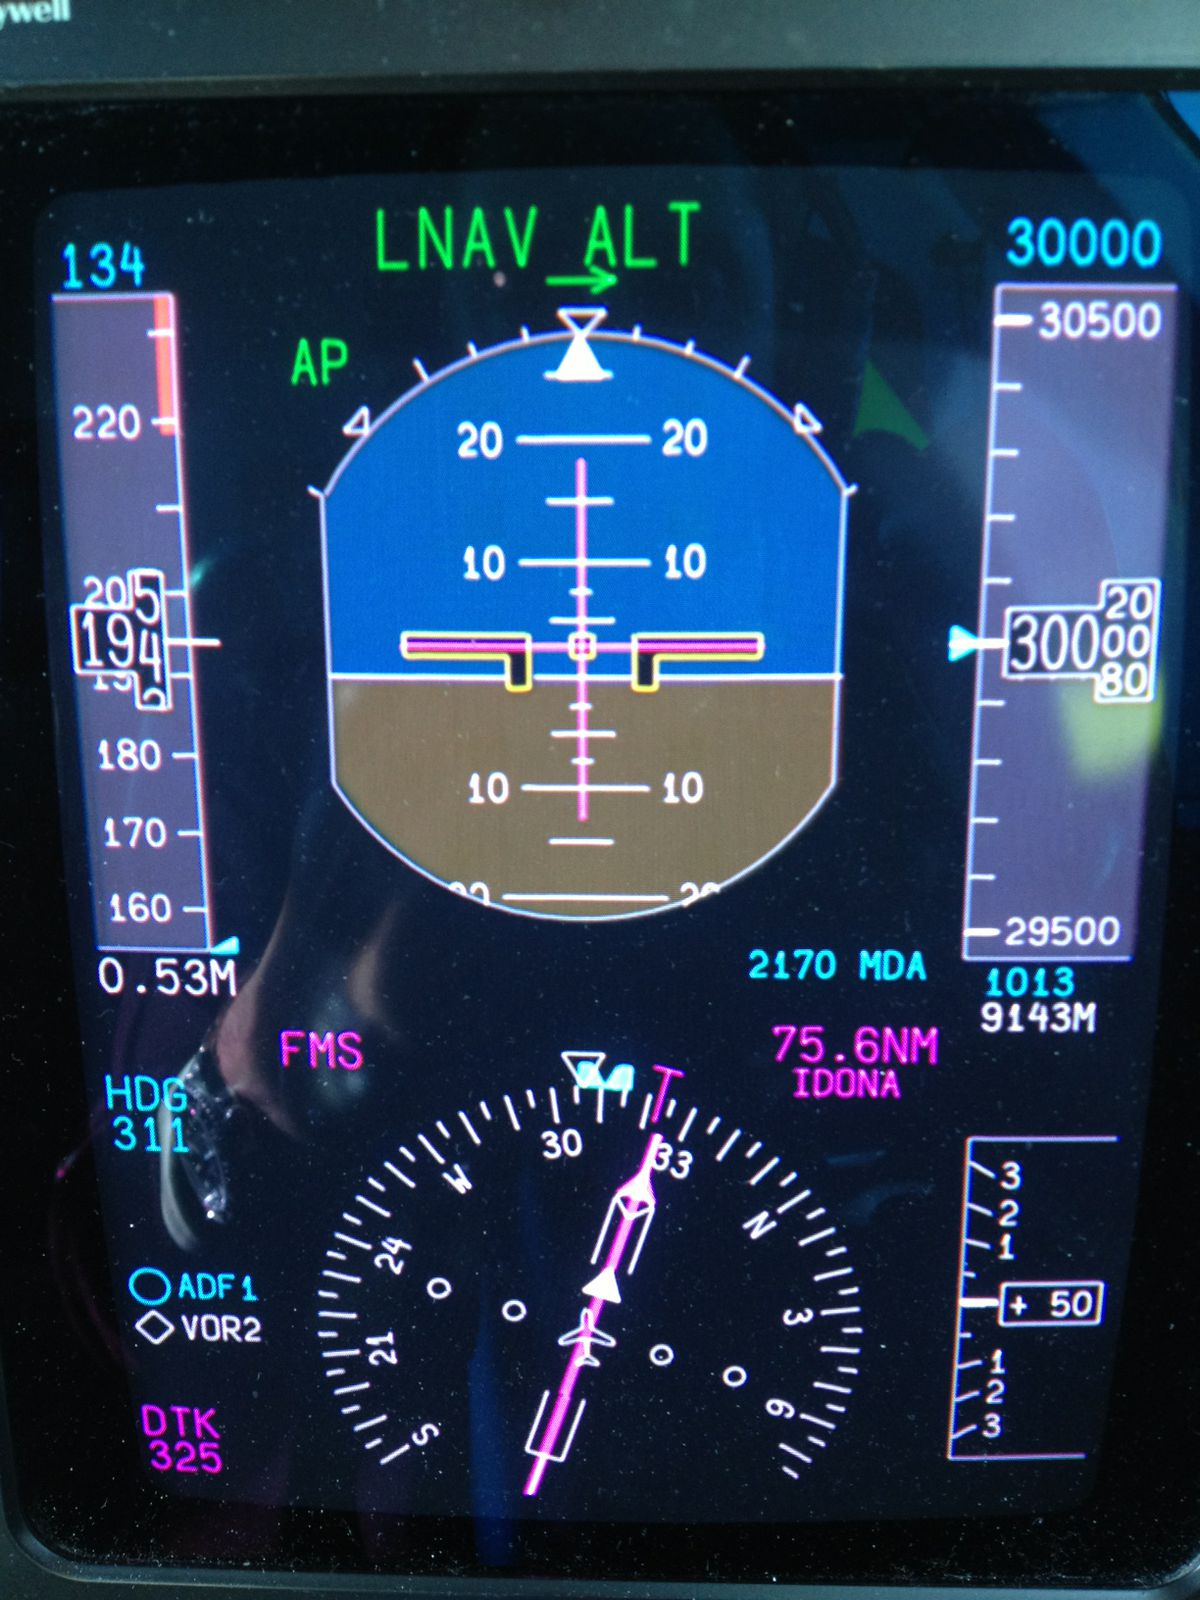 30'000 pieds